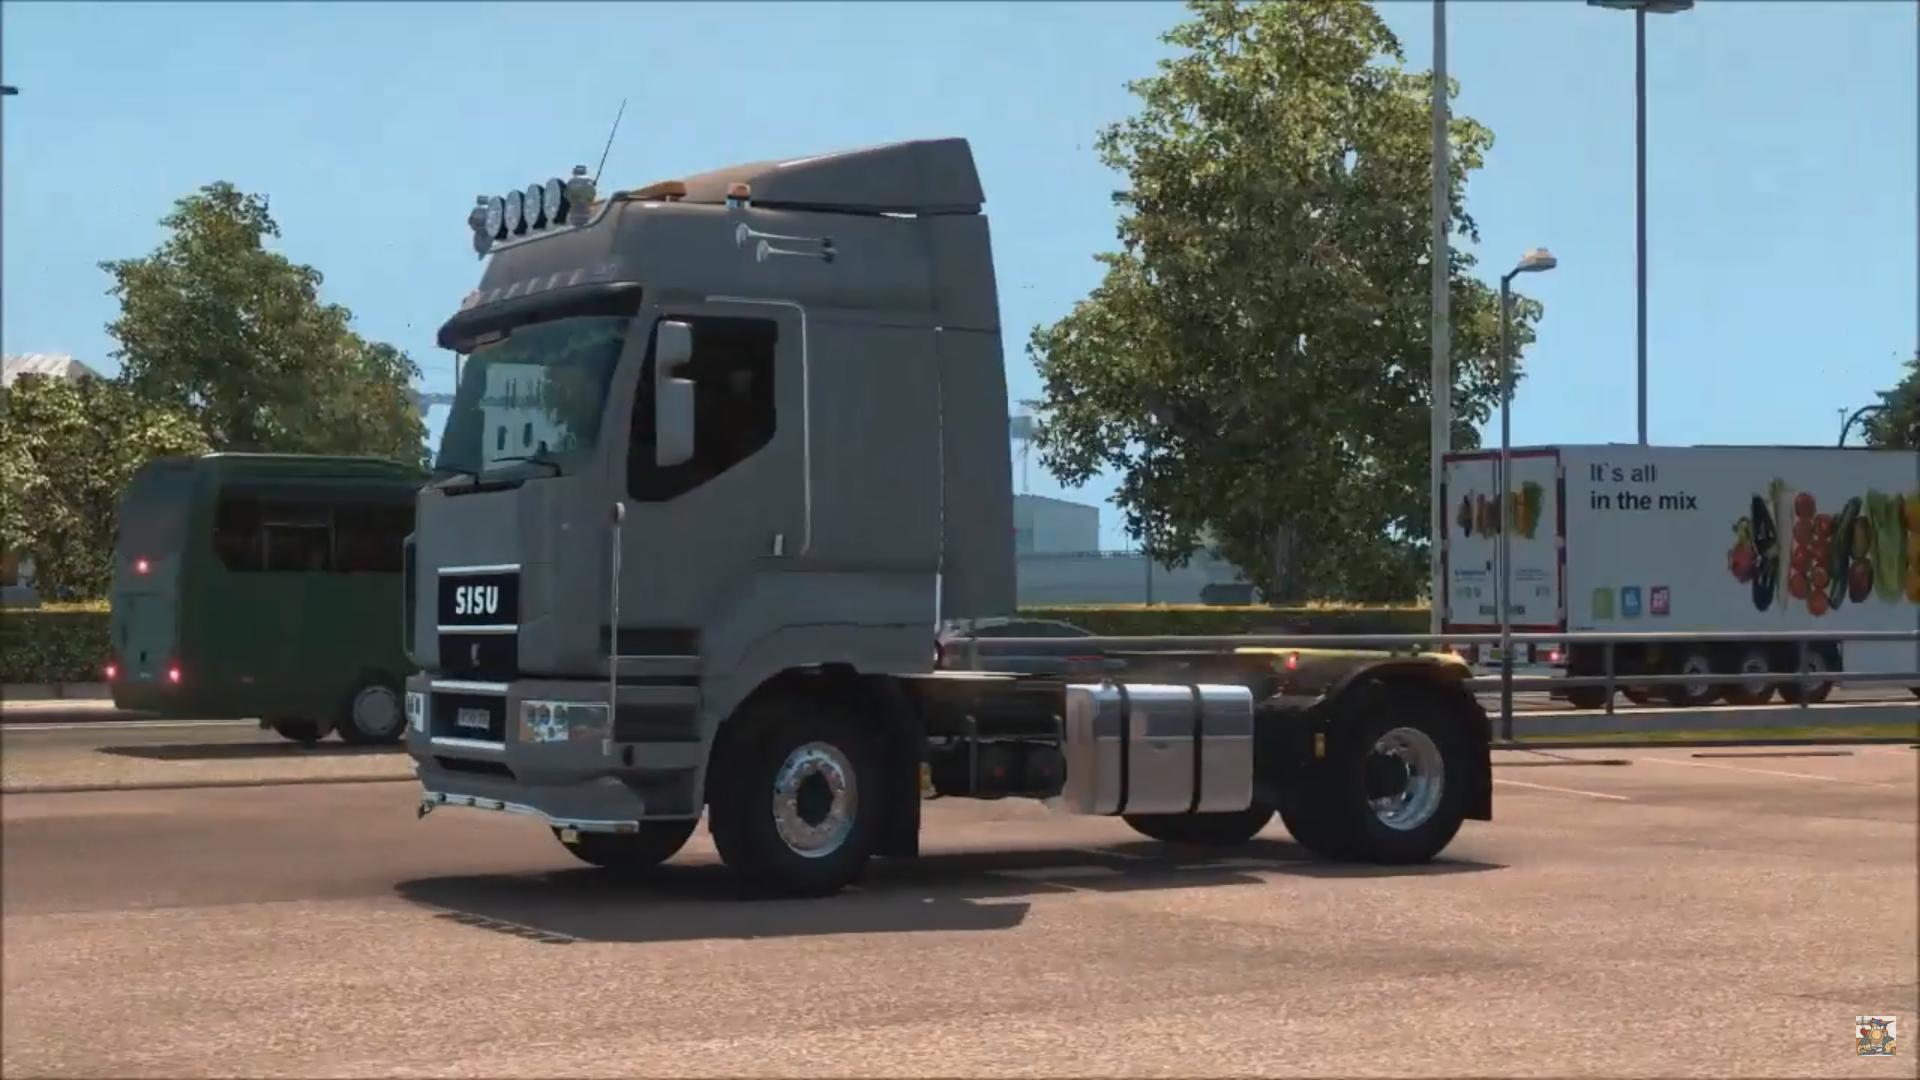 Sisu R500 C500 Amp C600 Truck Cabin Accessories Dlc Euro